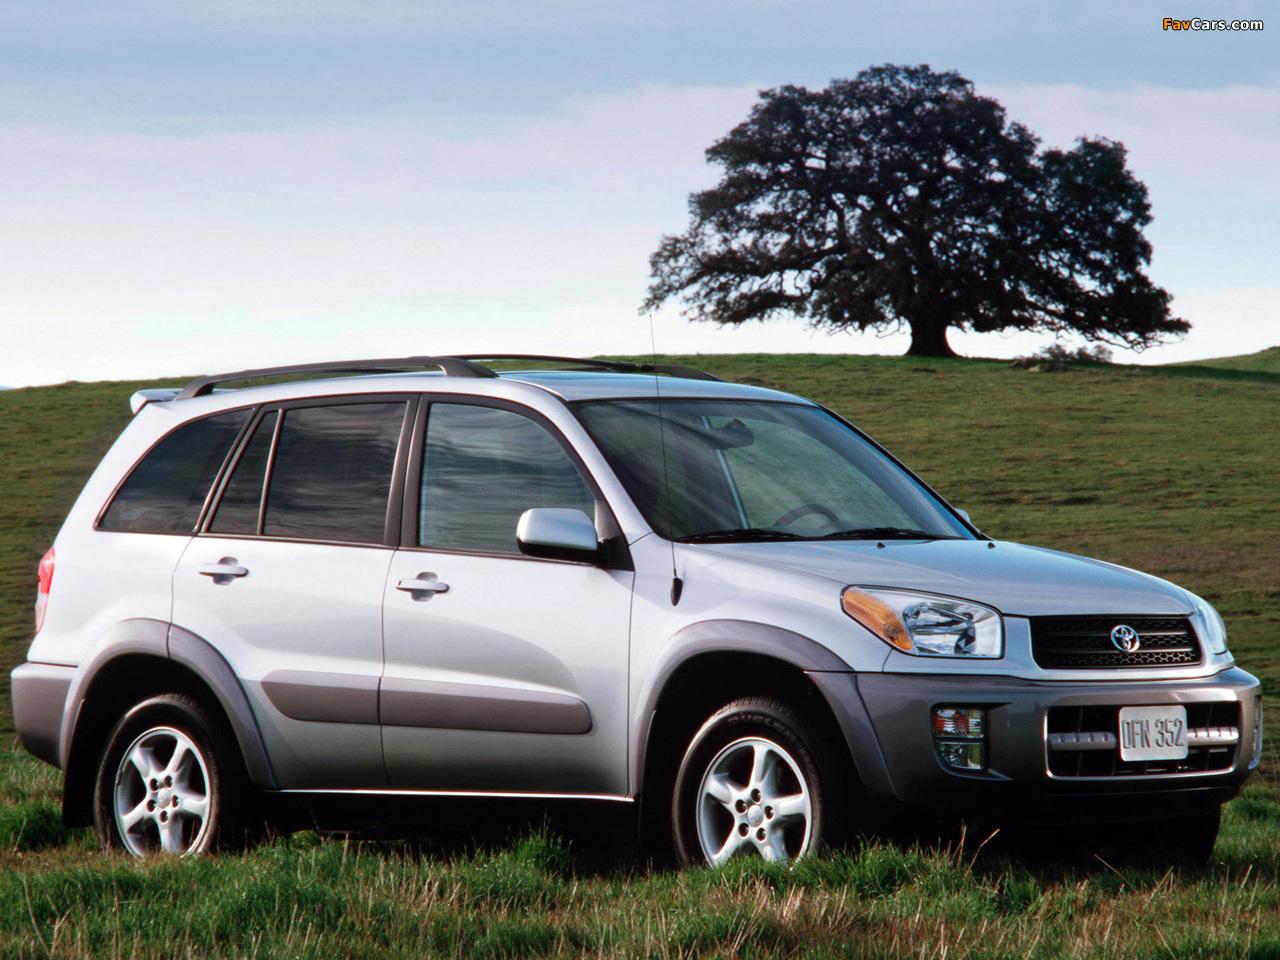 Toyota Rav4 Us Spec 2000 03 Wallpapers 1280x960